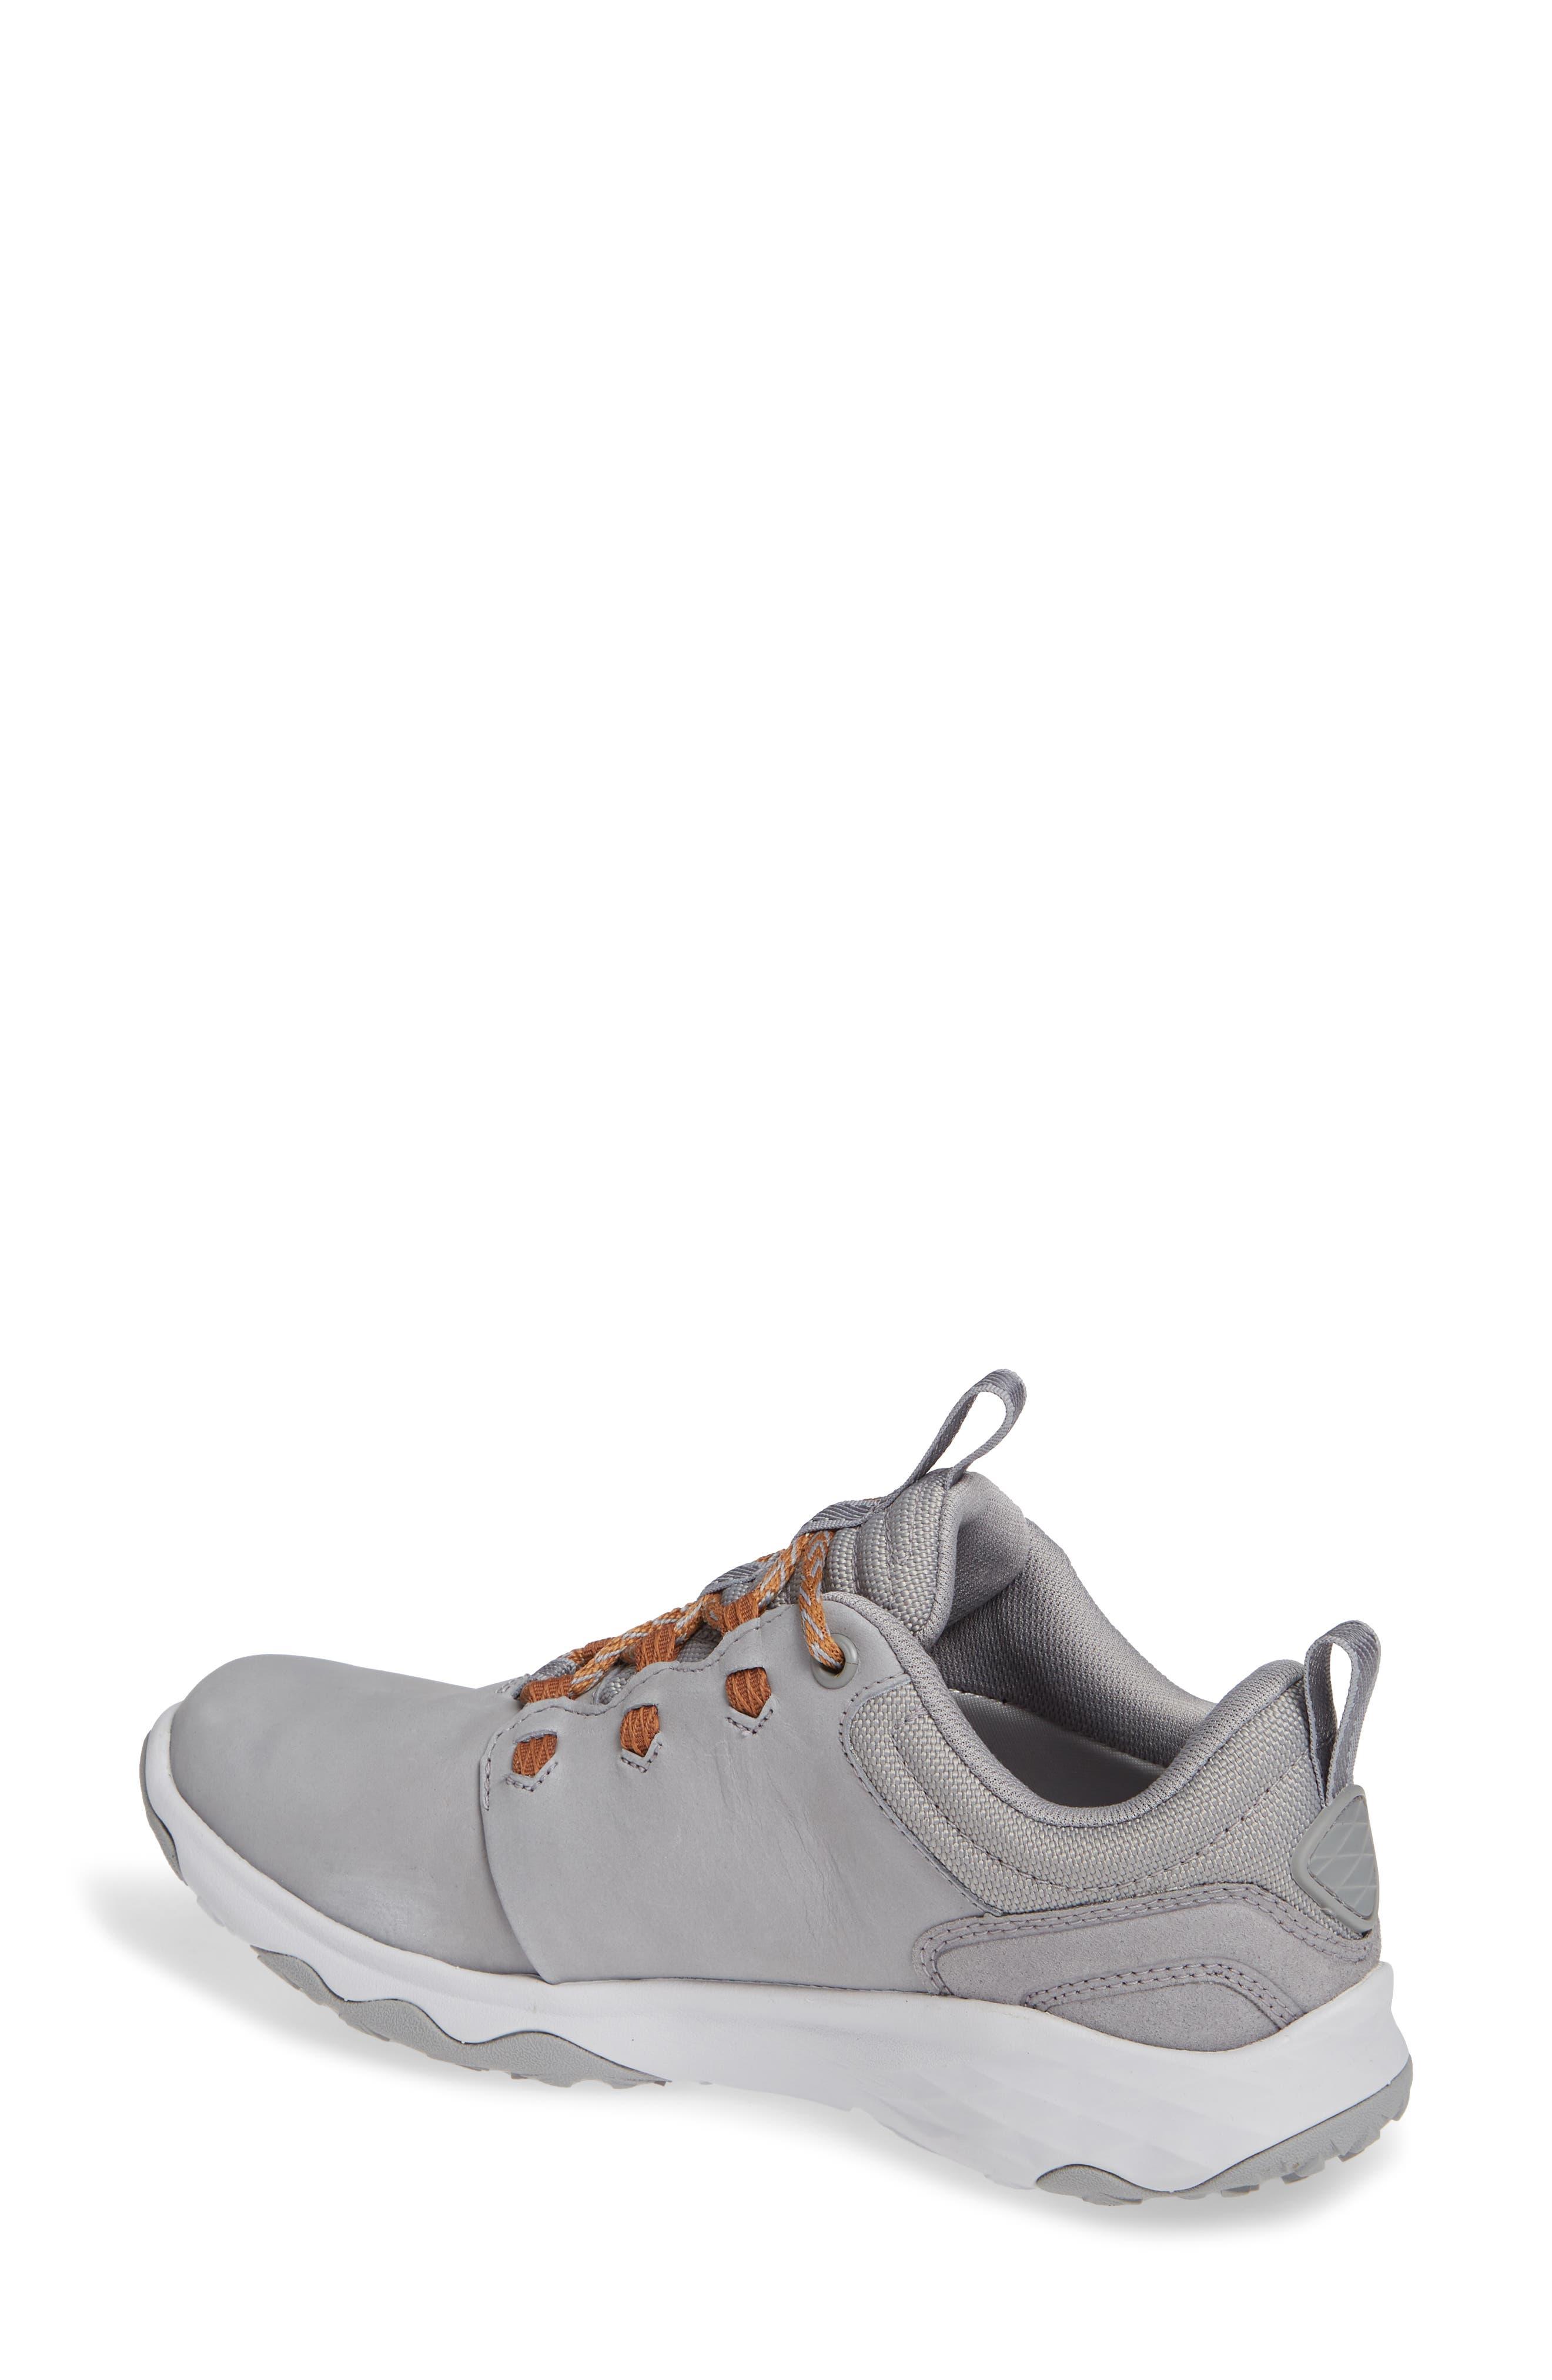 TEVA, 'Arrowood' Waterproof Sneaker, Alternate thumbnail 2, color, WILD DOVE LEATHER